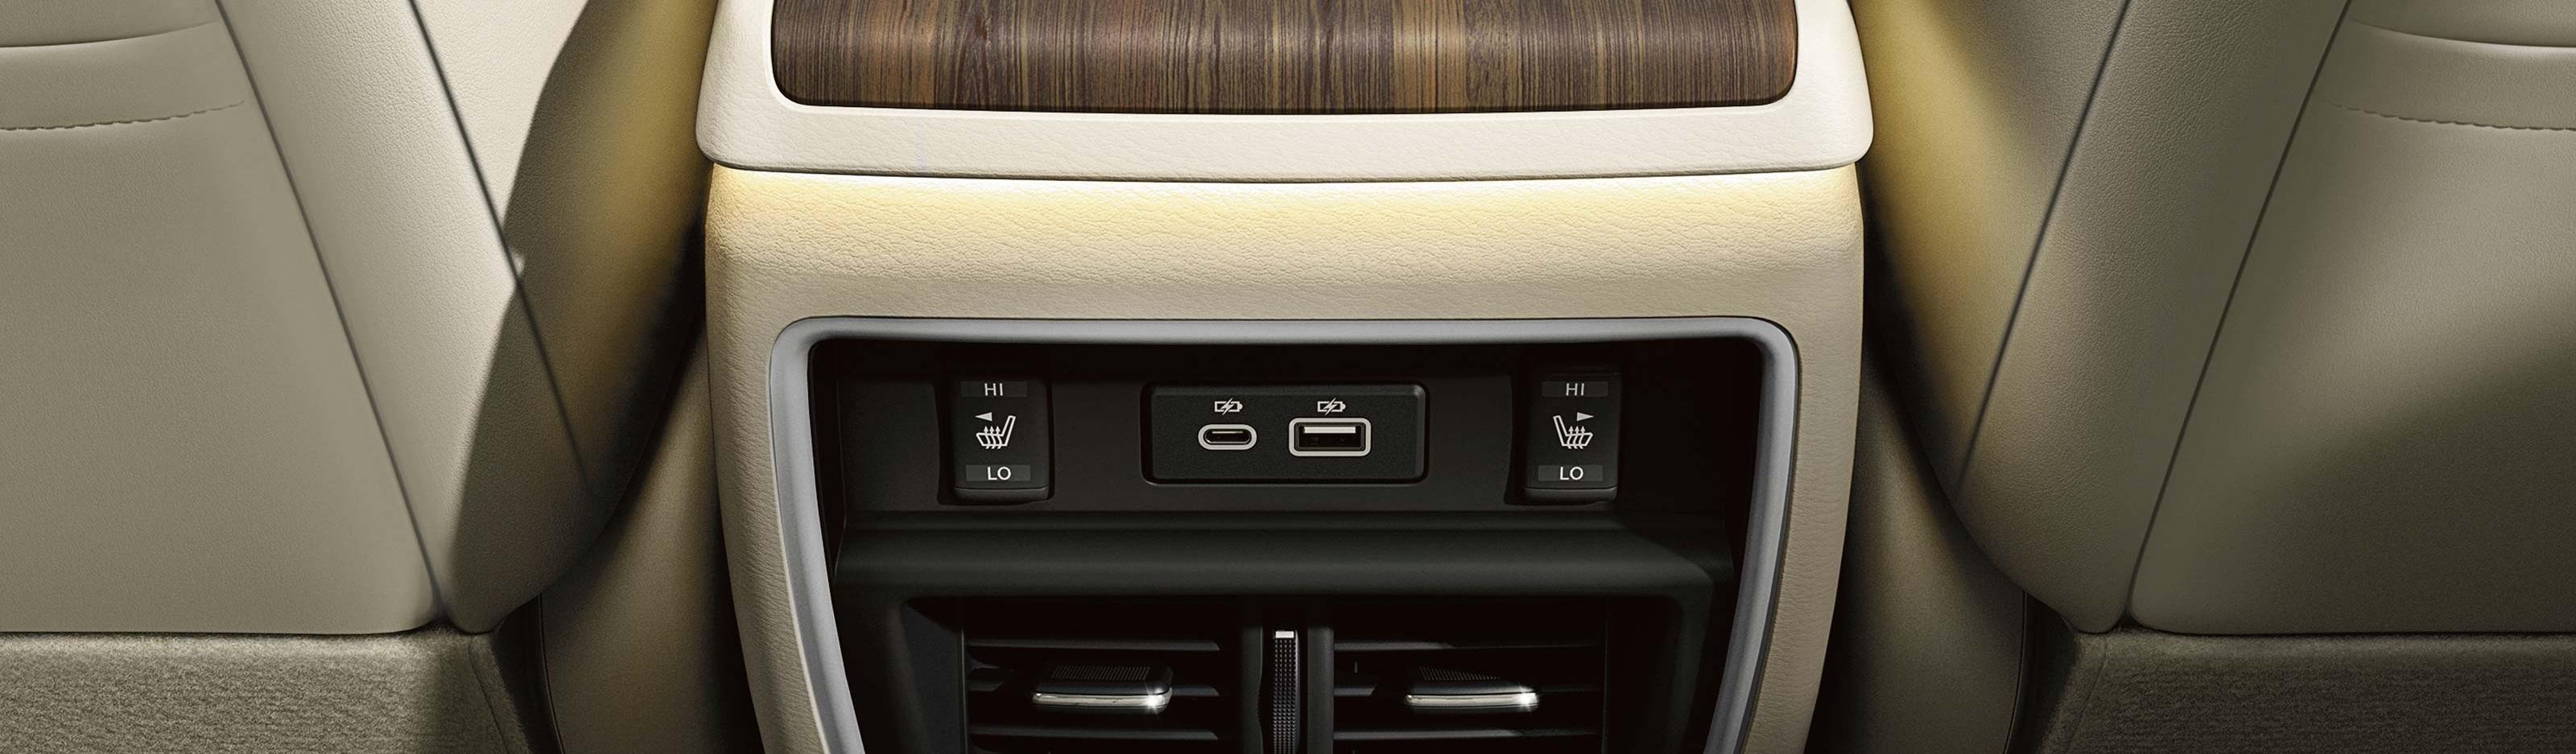 2020 Nissan Murano Interior Details